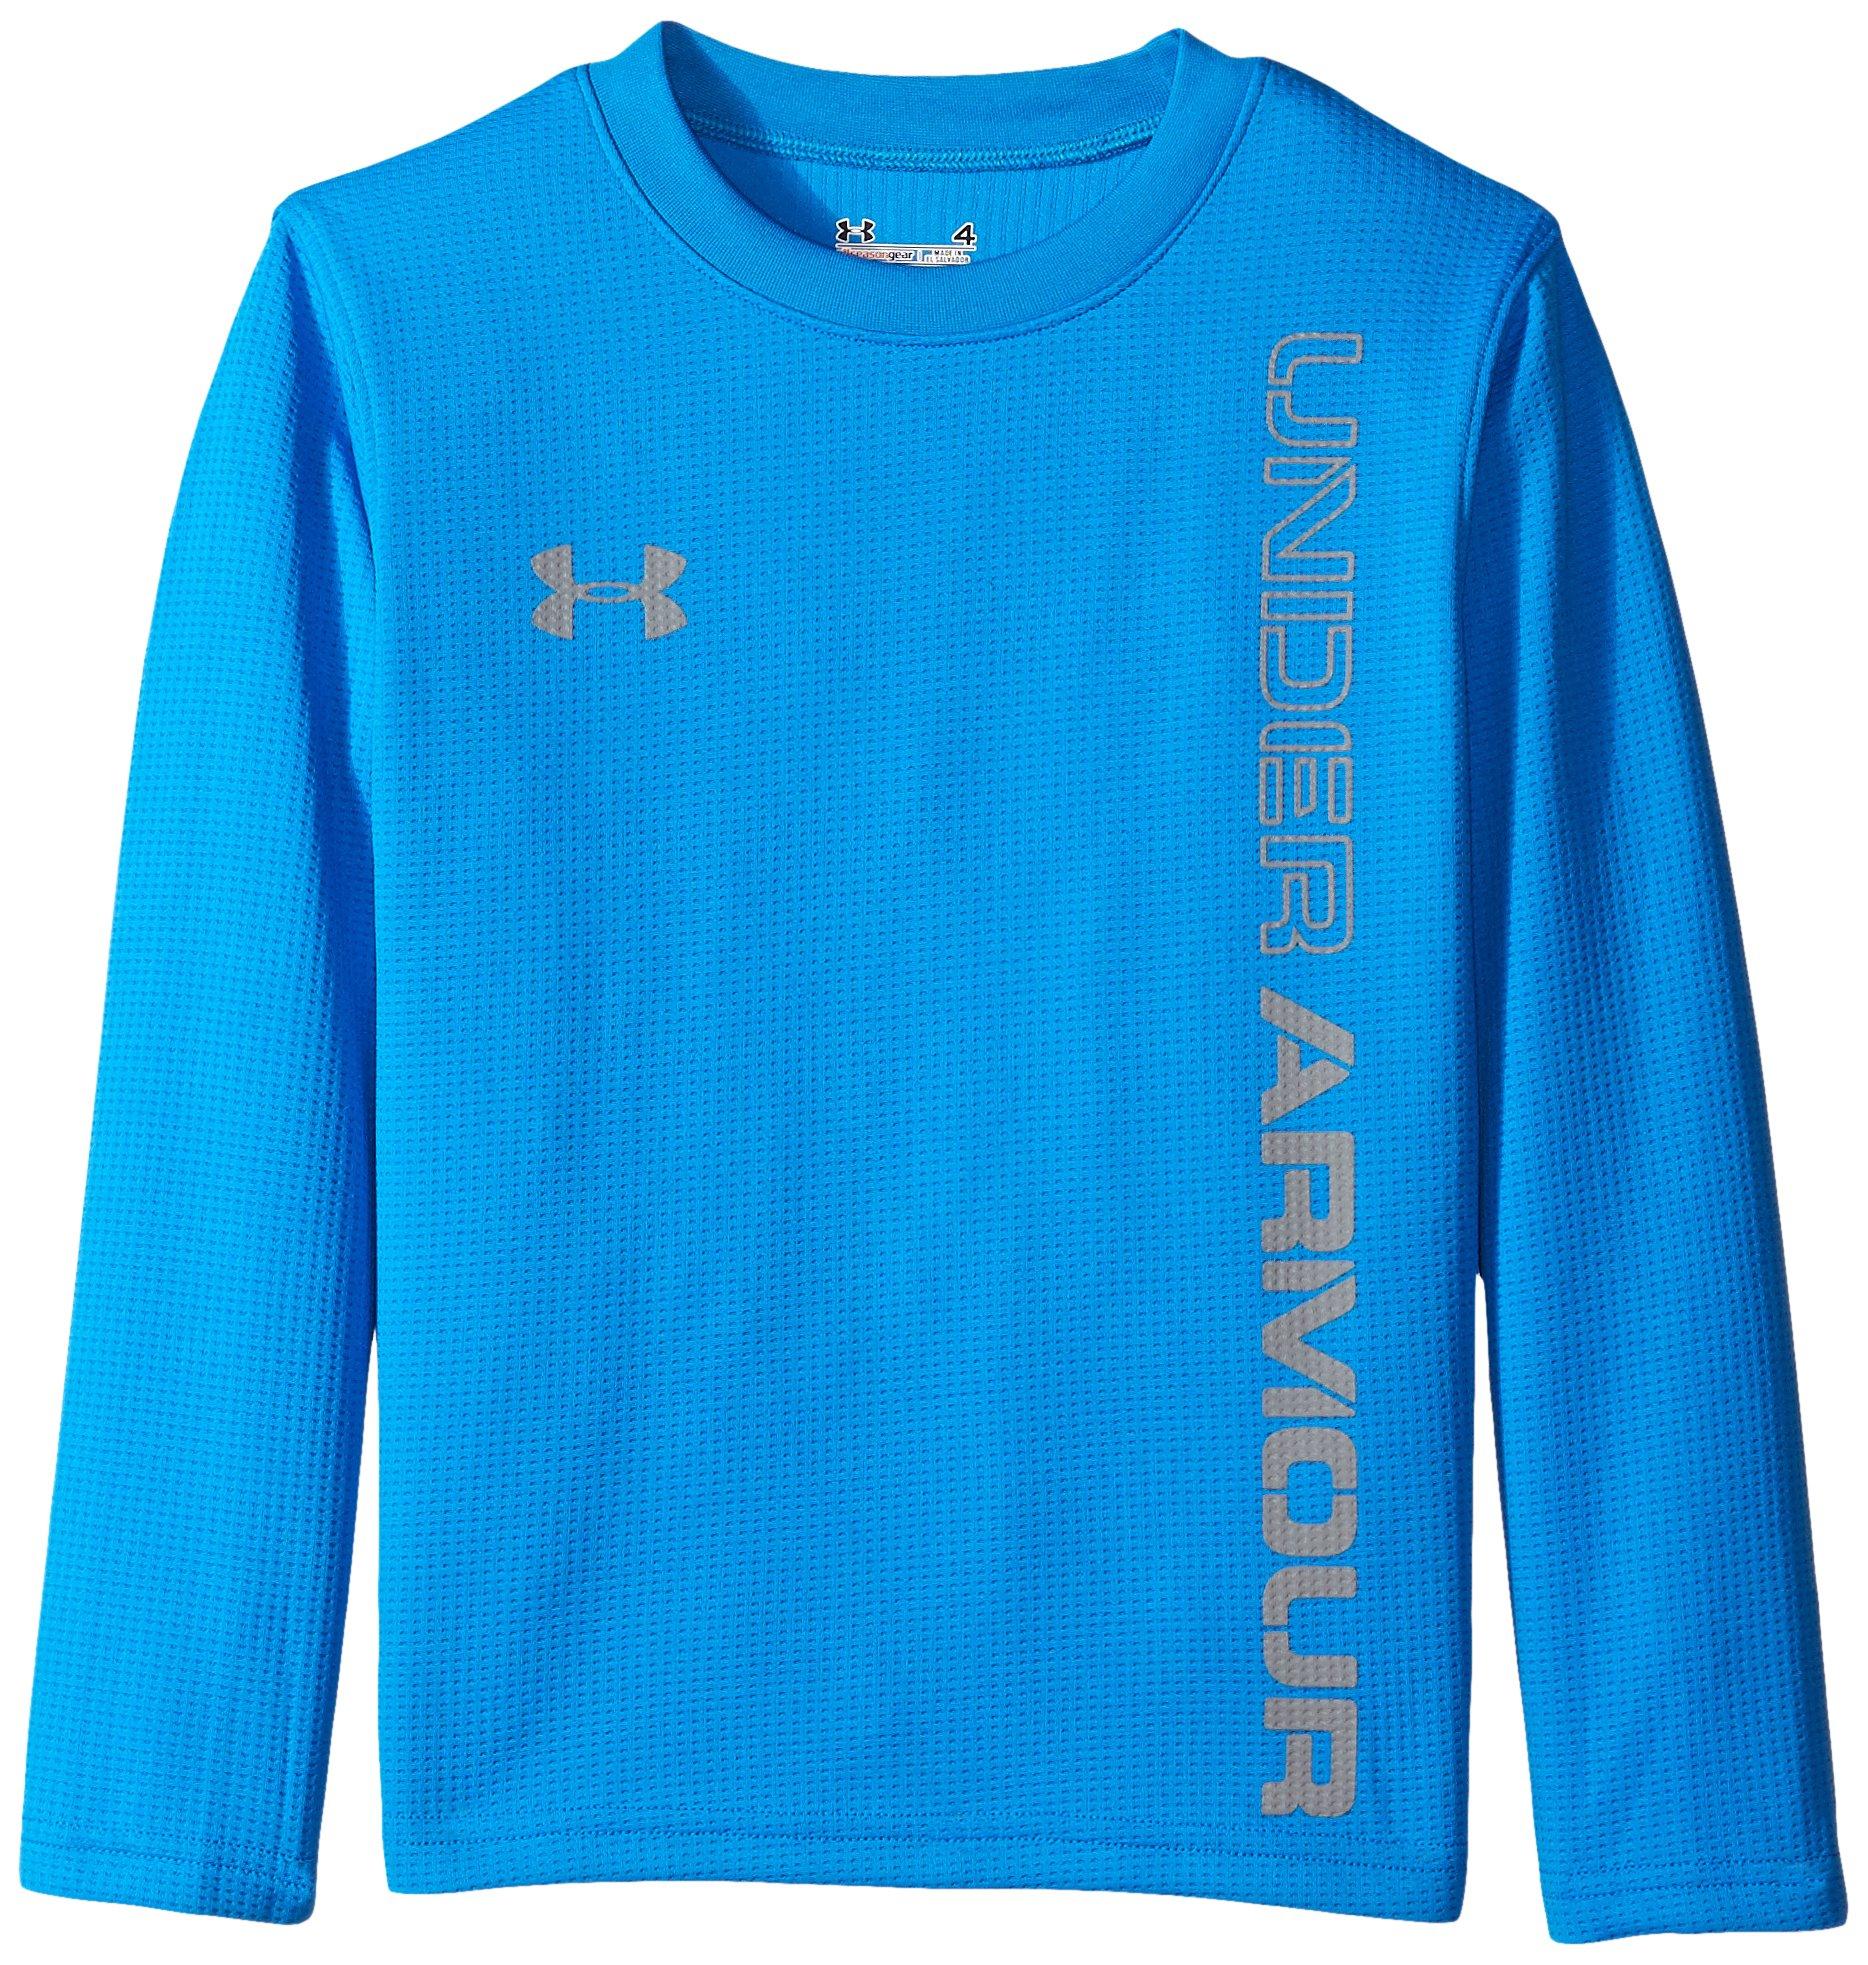 Under Armour Little Boys' Long Sleeve Tee Shirt, Blue Jet, 6